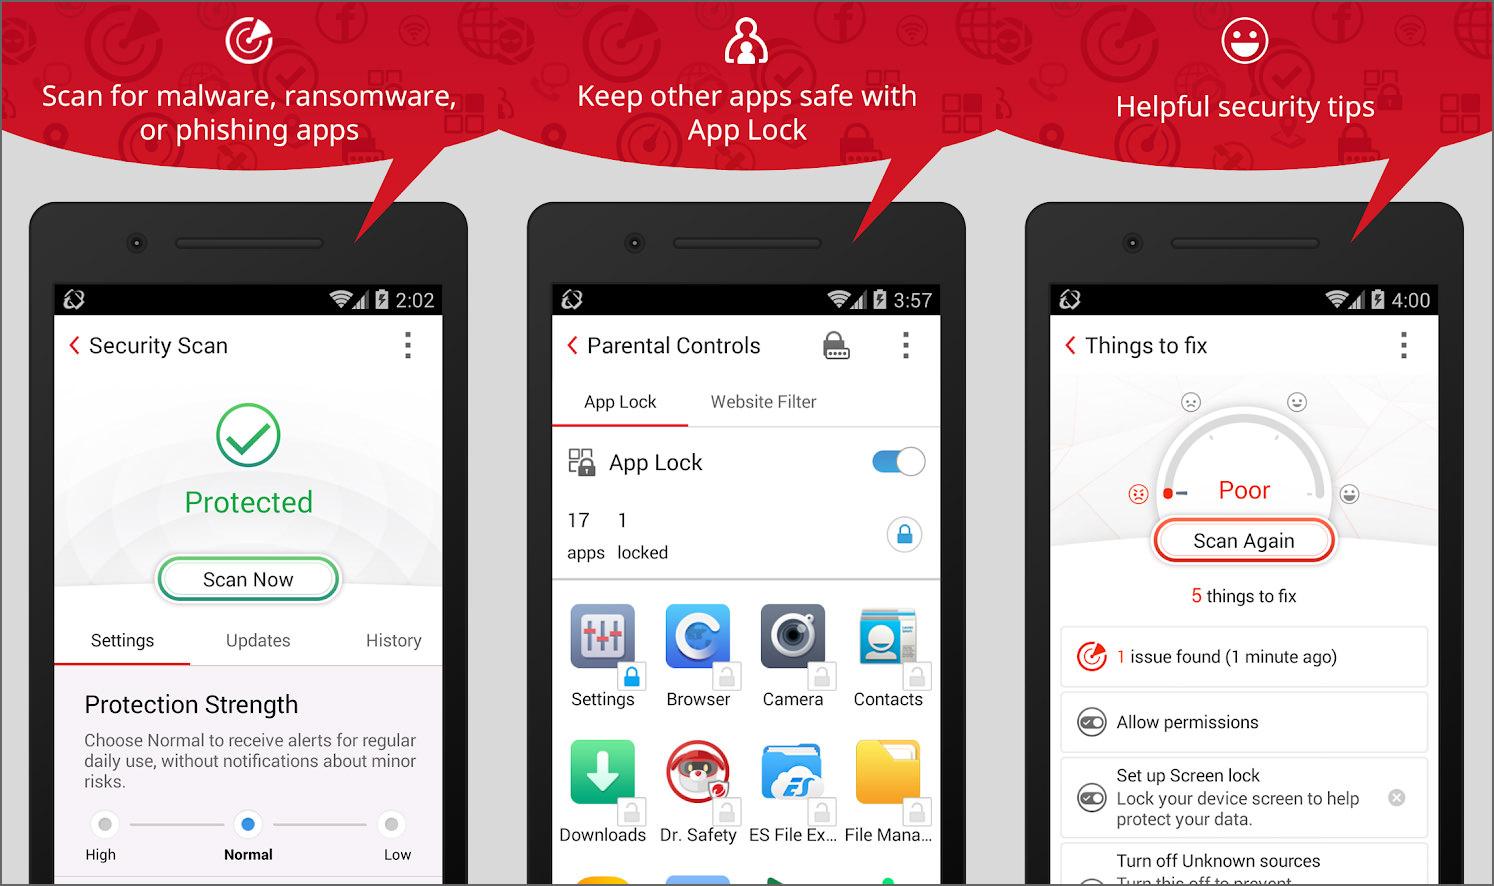 26 Best Android Antivirus - Free Anti-Theft, AppLock, Call